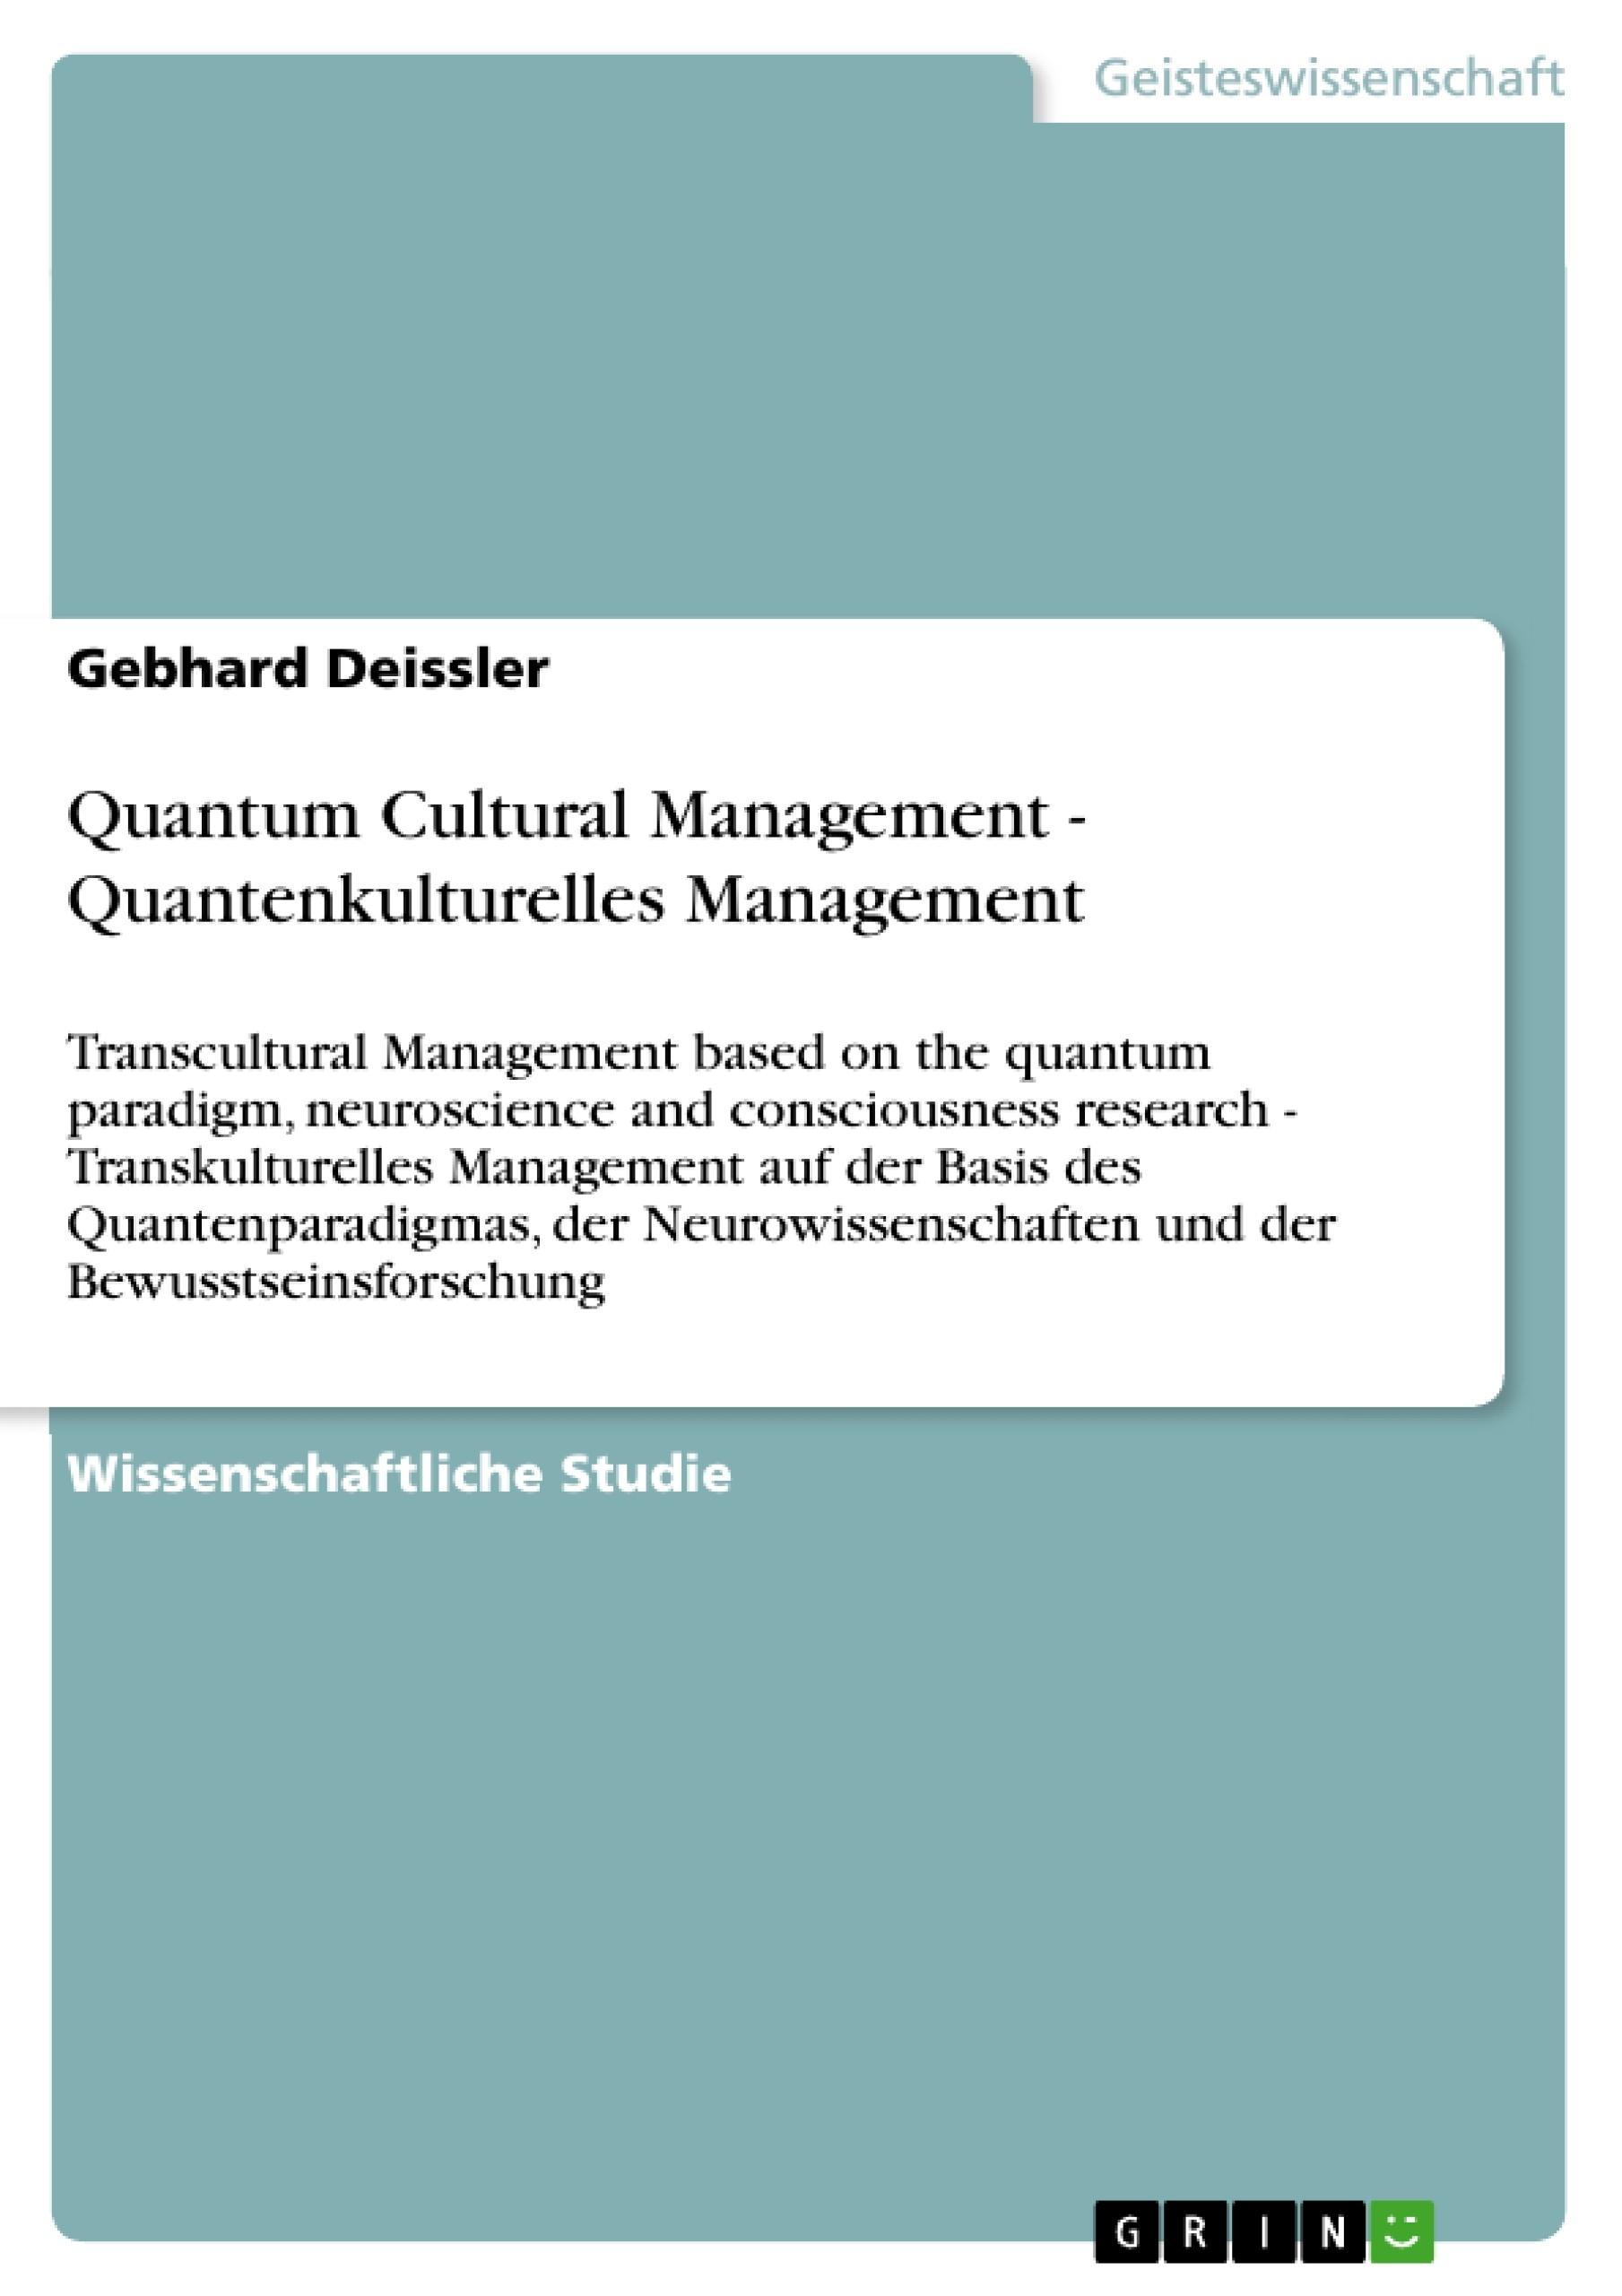 Titel: Quantum Cultural  Management - Quantenkulturelles Management